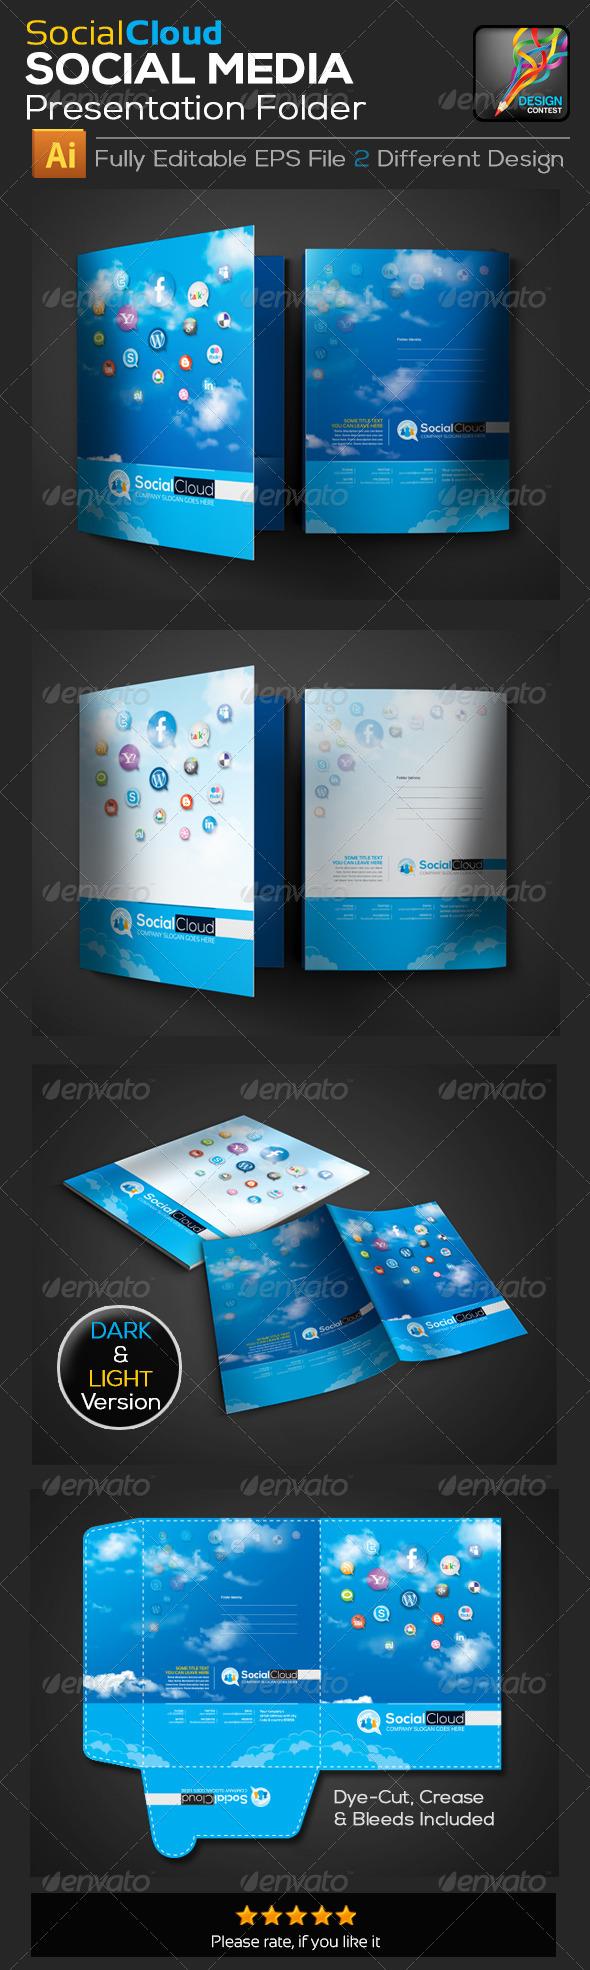 GraphicRiver Social Cloud Social Media Presentation Folder De 5744140